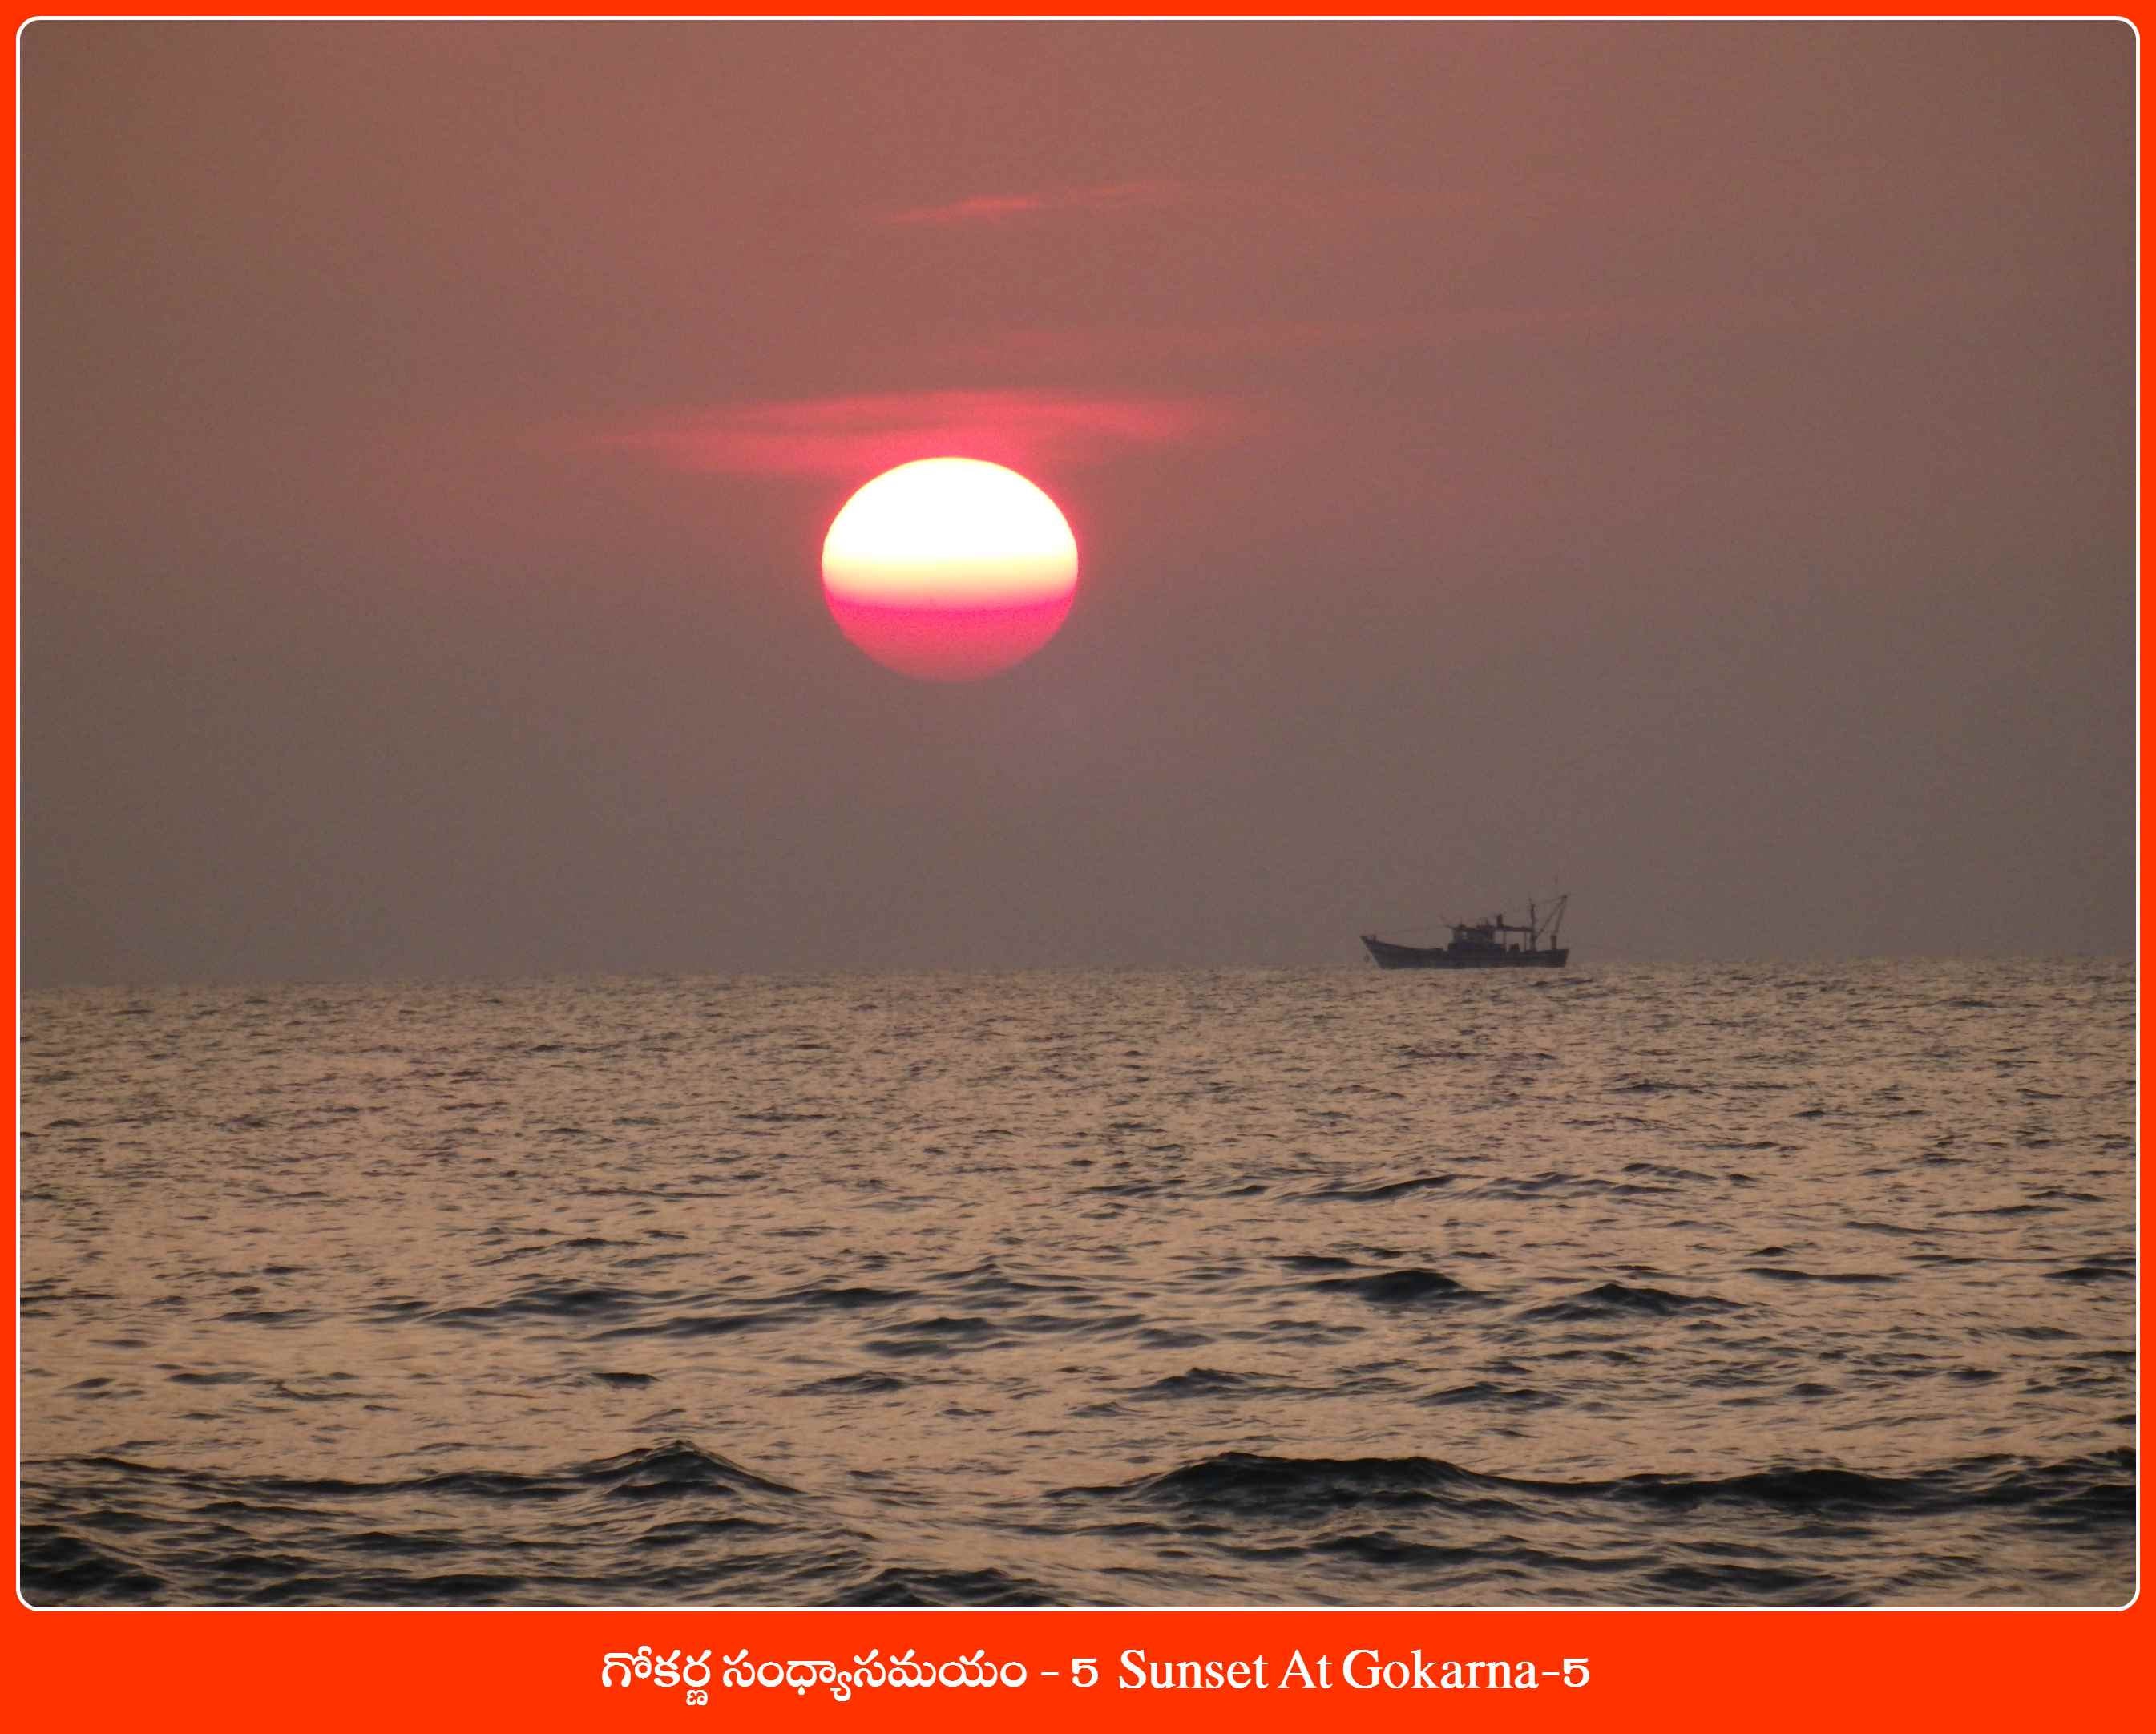 Sunset At Gokarna-5